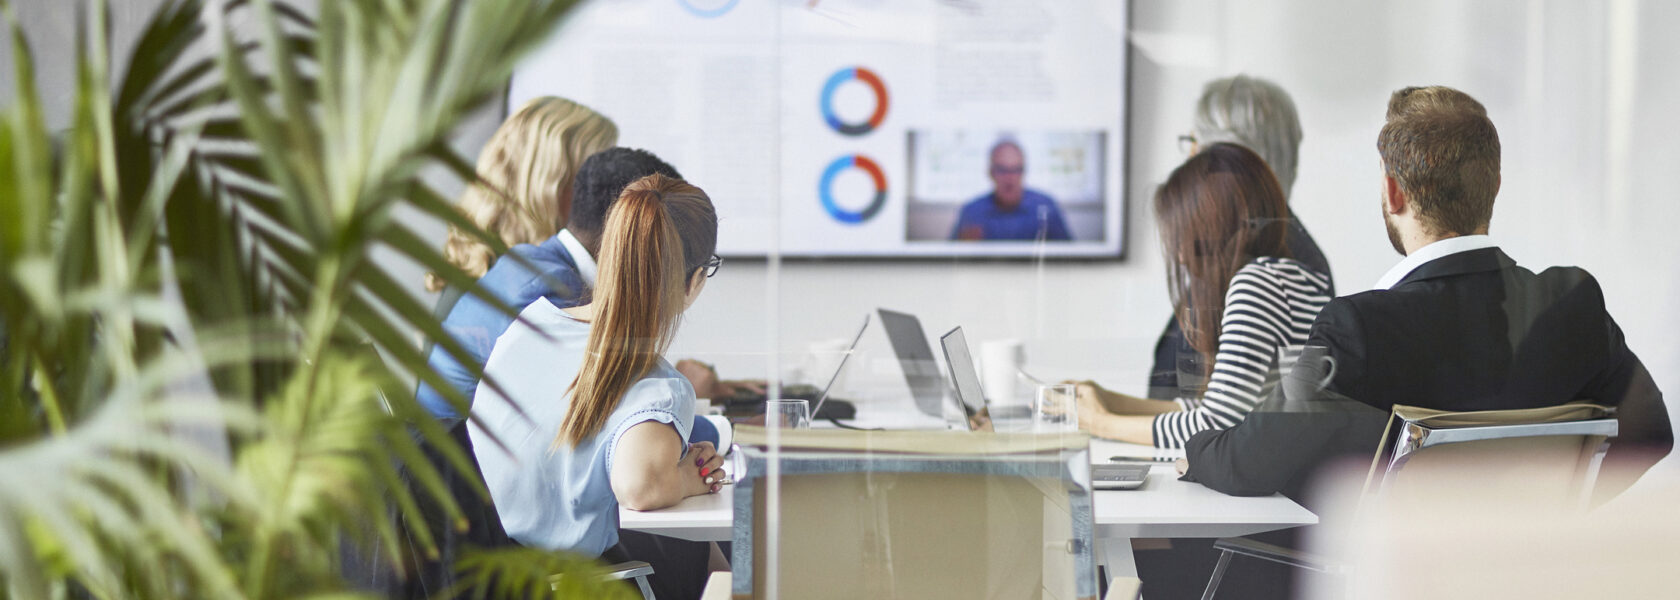 Digital workplace dans une entreprise en Wallonie